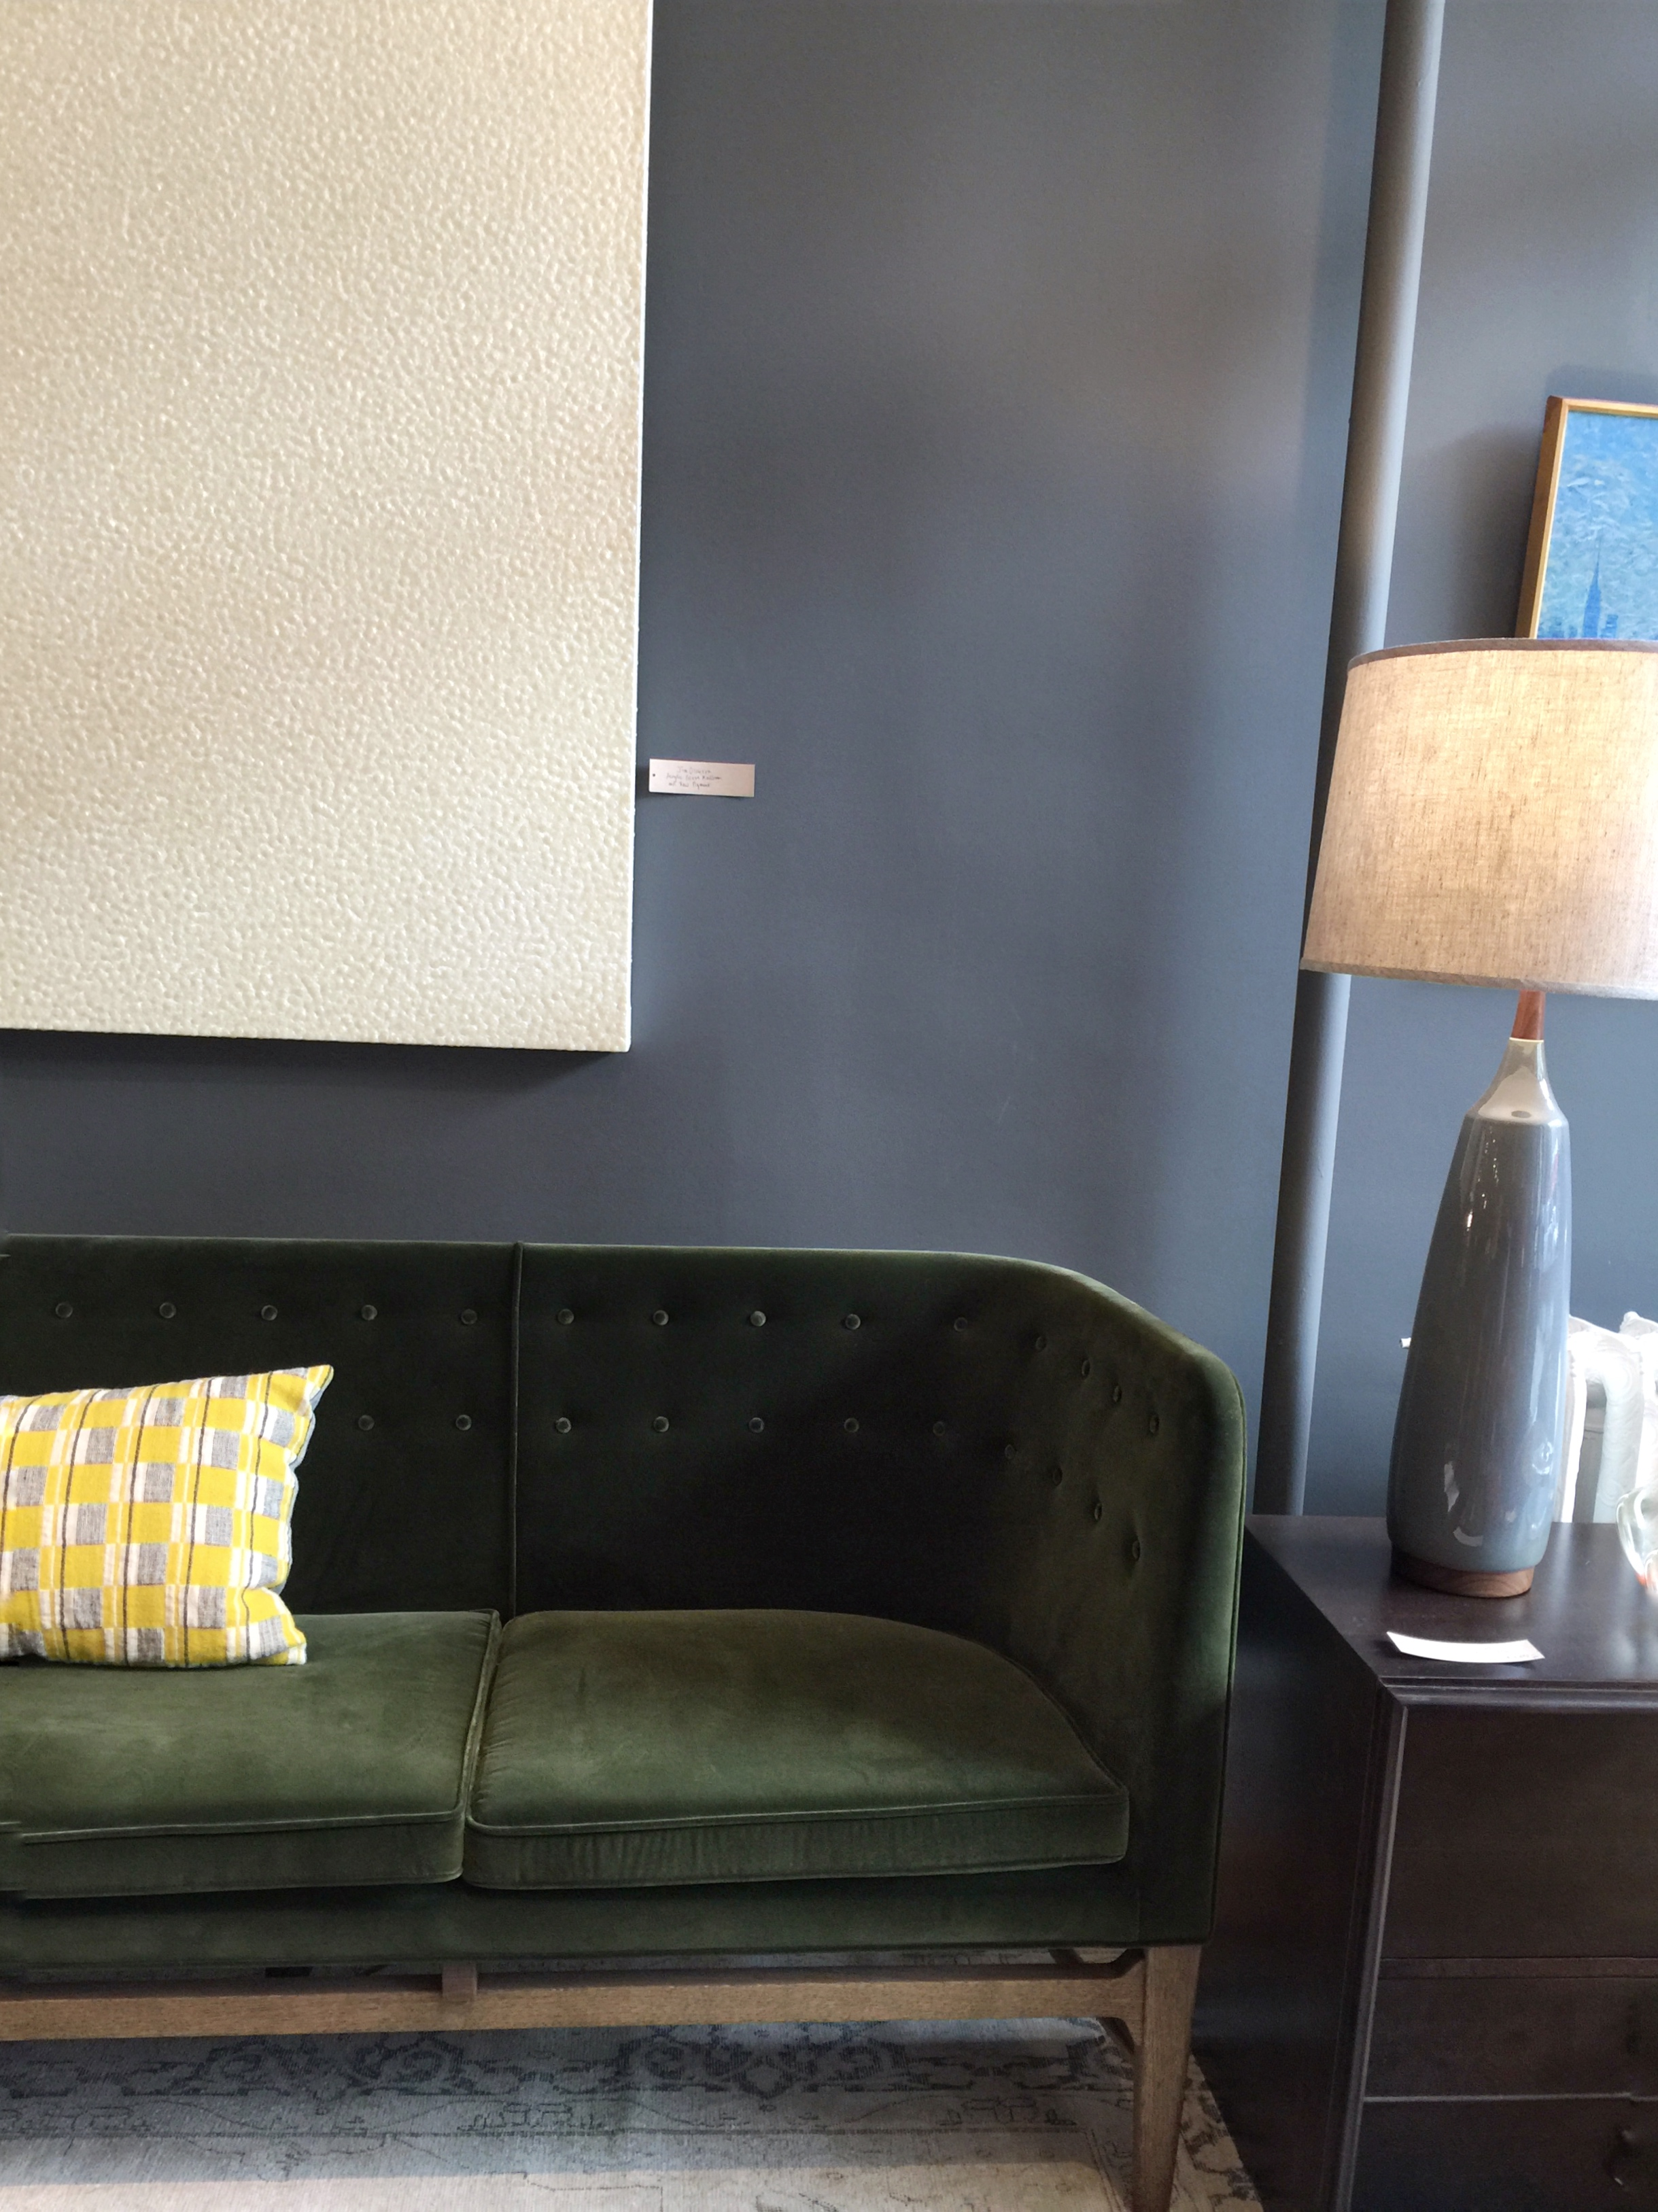 Finch Hudson's beautiful modern furniture